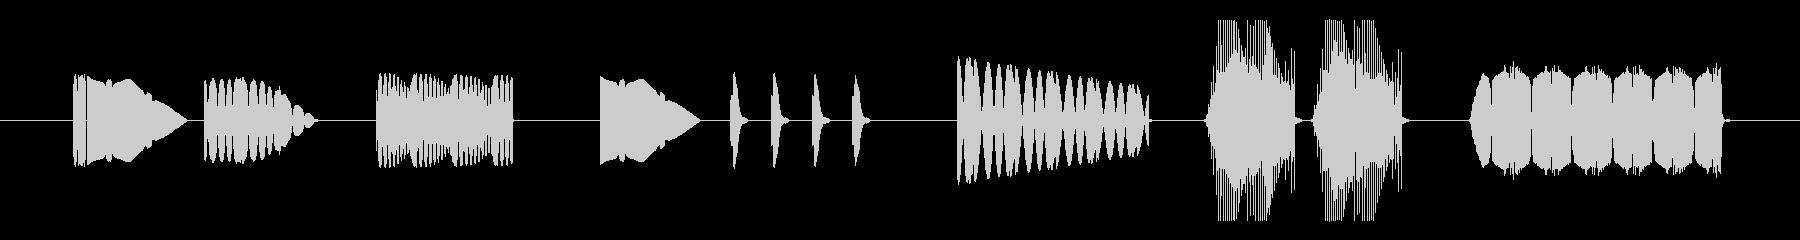 FX アーケードシューティングプレイ01の未再生の波形